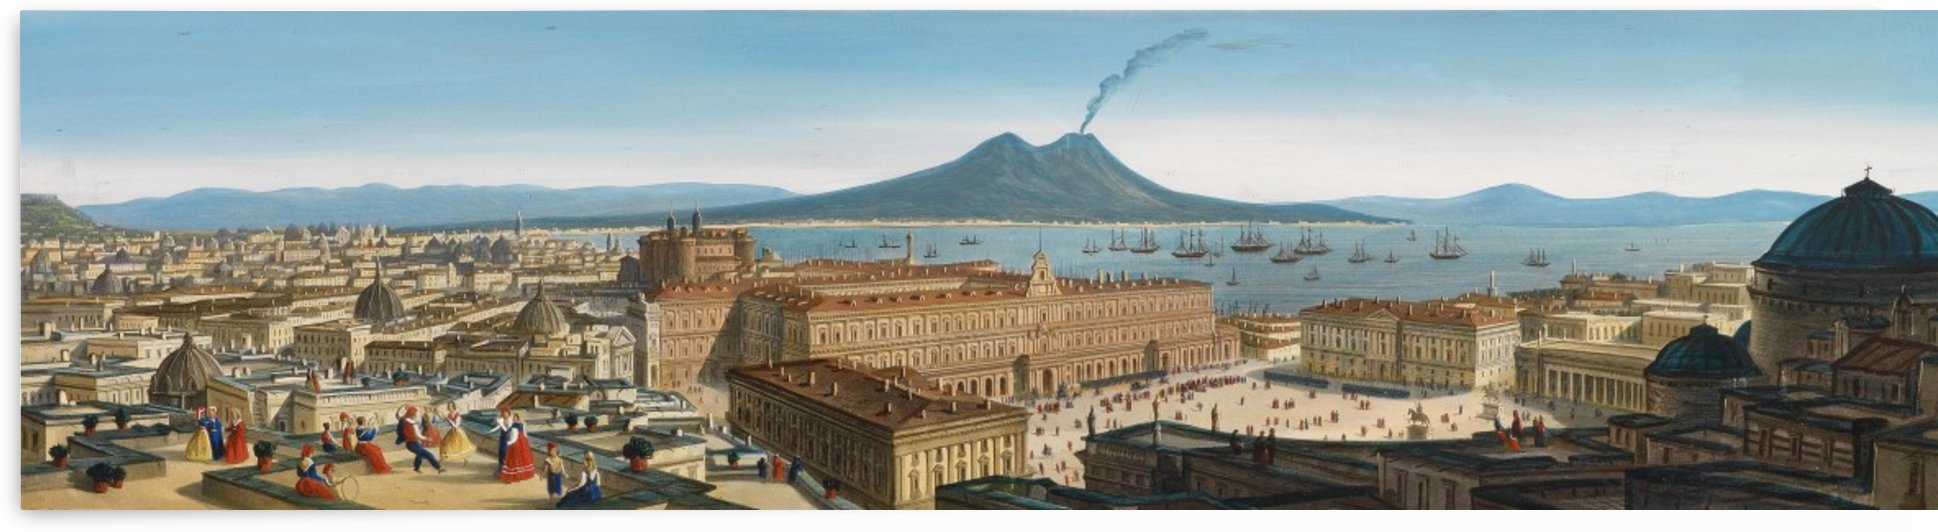 Panorama von Neapel by Leopoldo Calvi